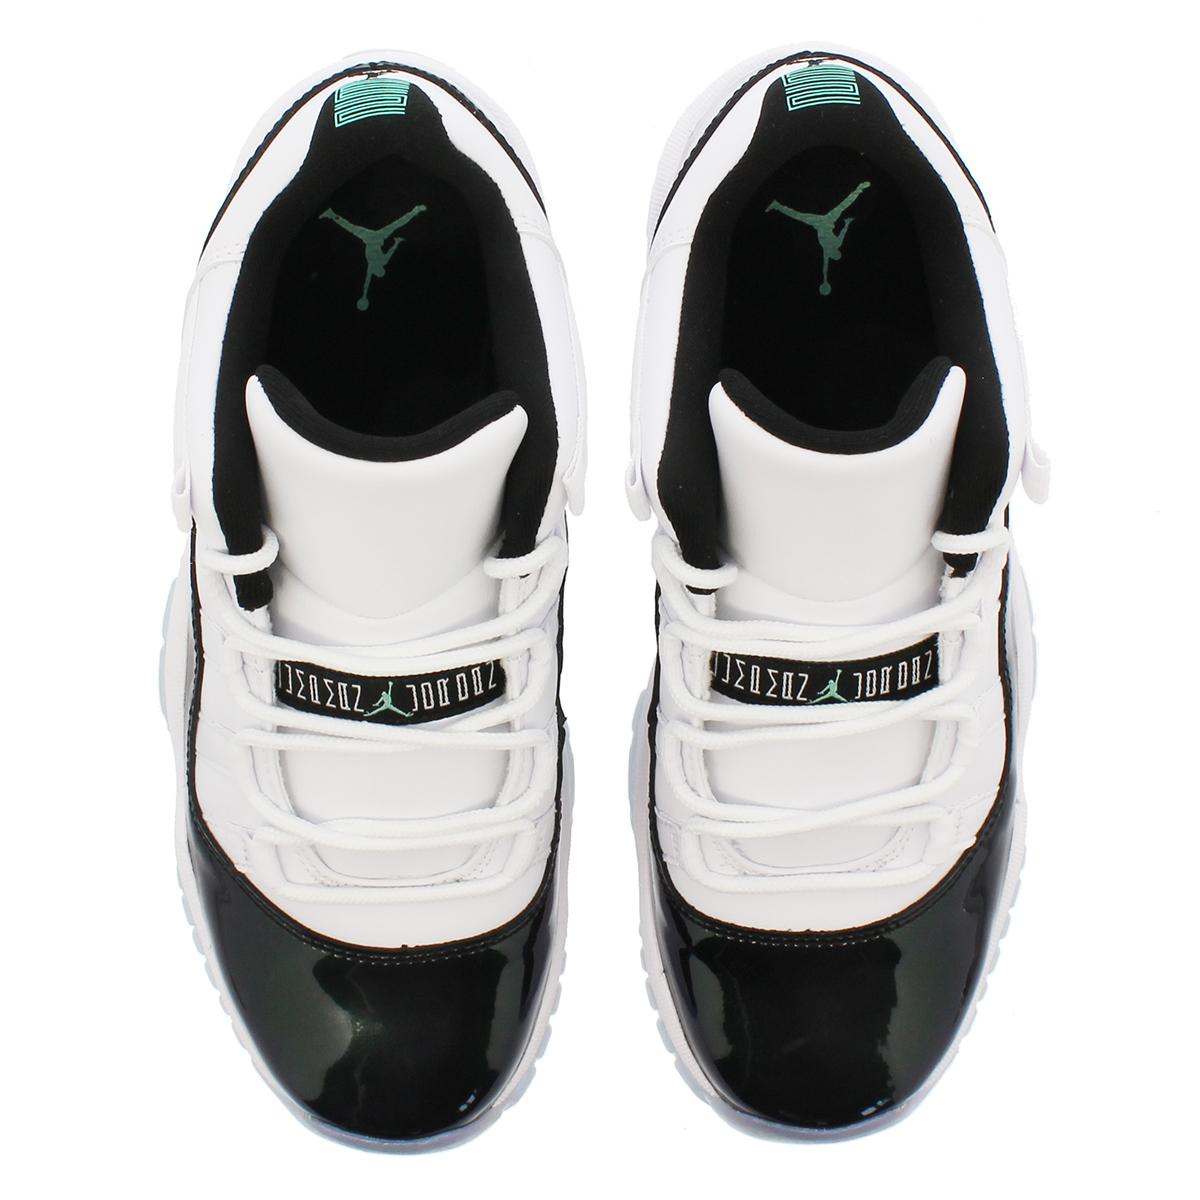 2ade0984c55f95 NIKE AIR JORDAN 11 RETRO LOW BG Nike Air Jordan 11 nostalgic low BG  WHITE BLACK EMERALD RISE 528